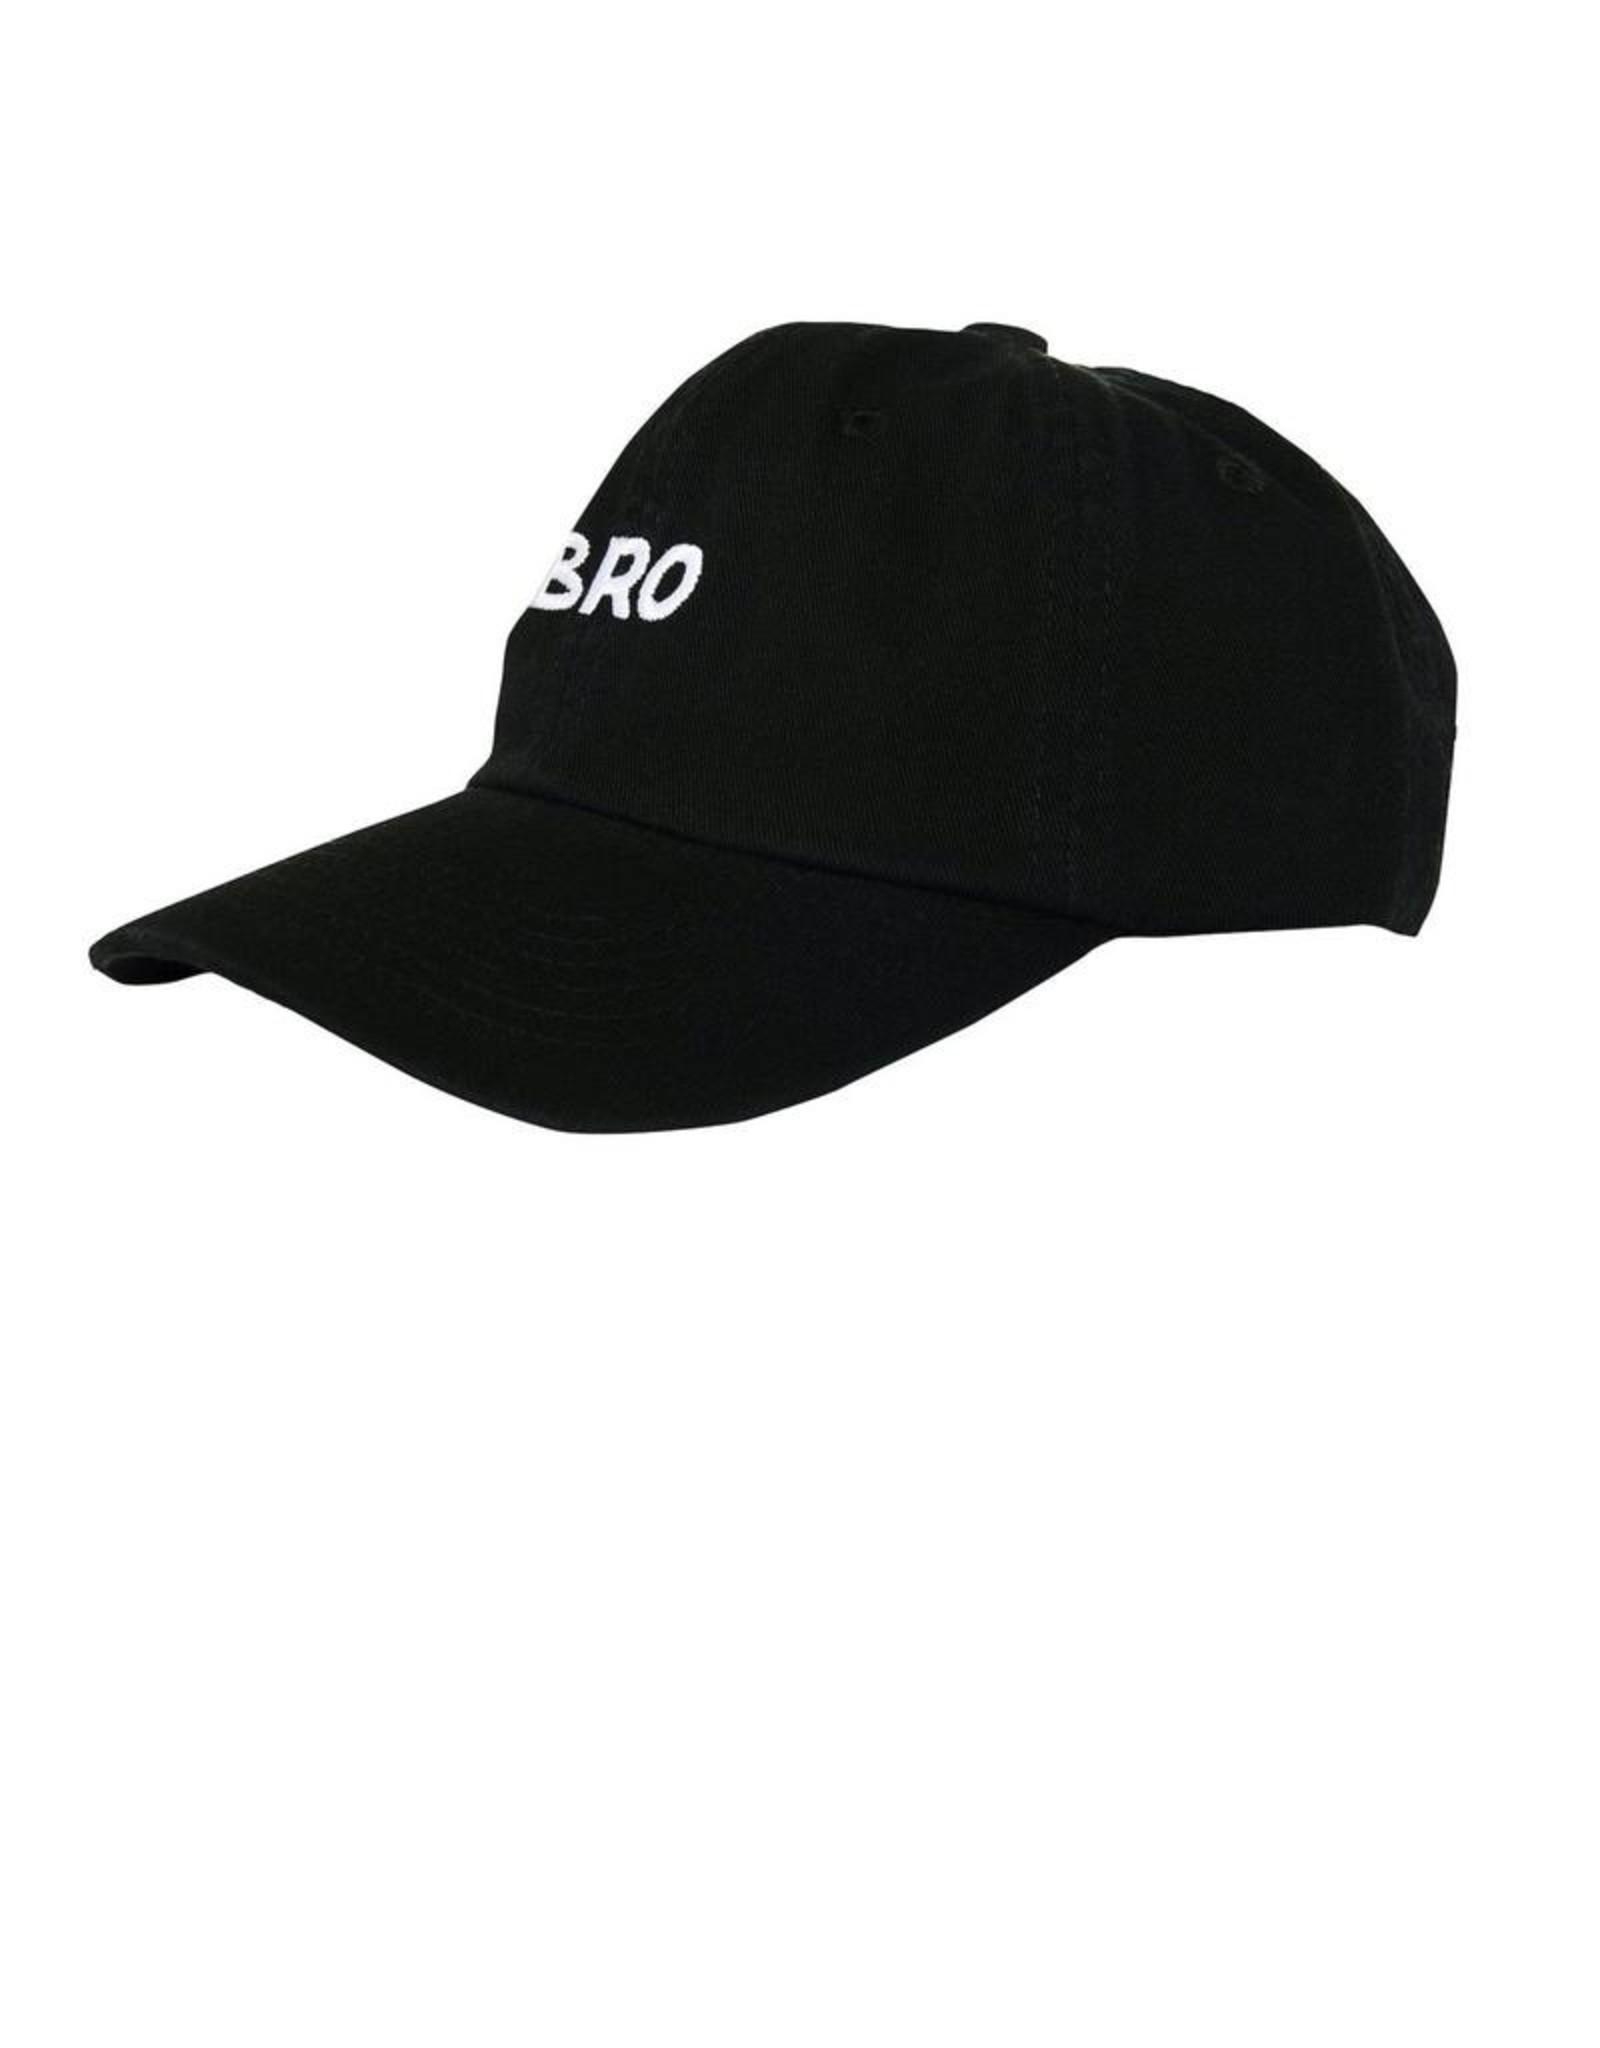 Headster Kids Bro Adjustable Hat